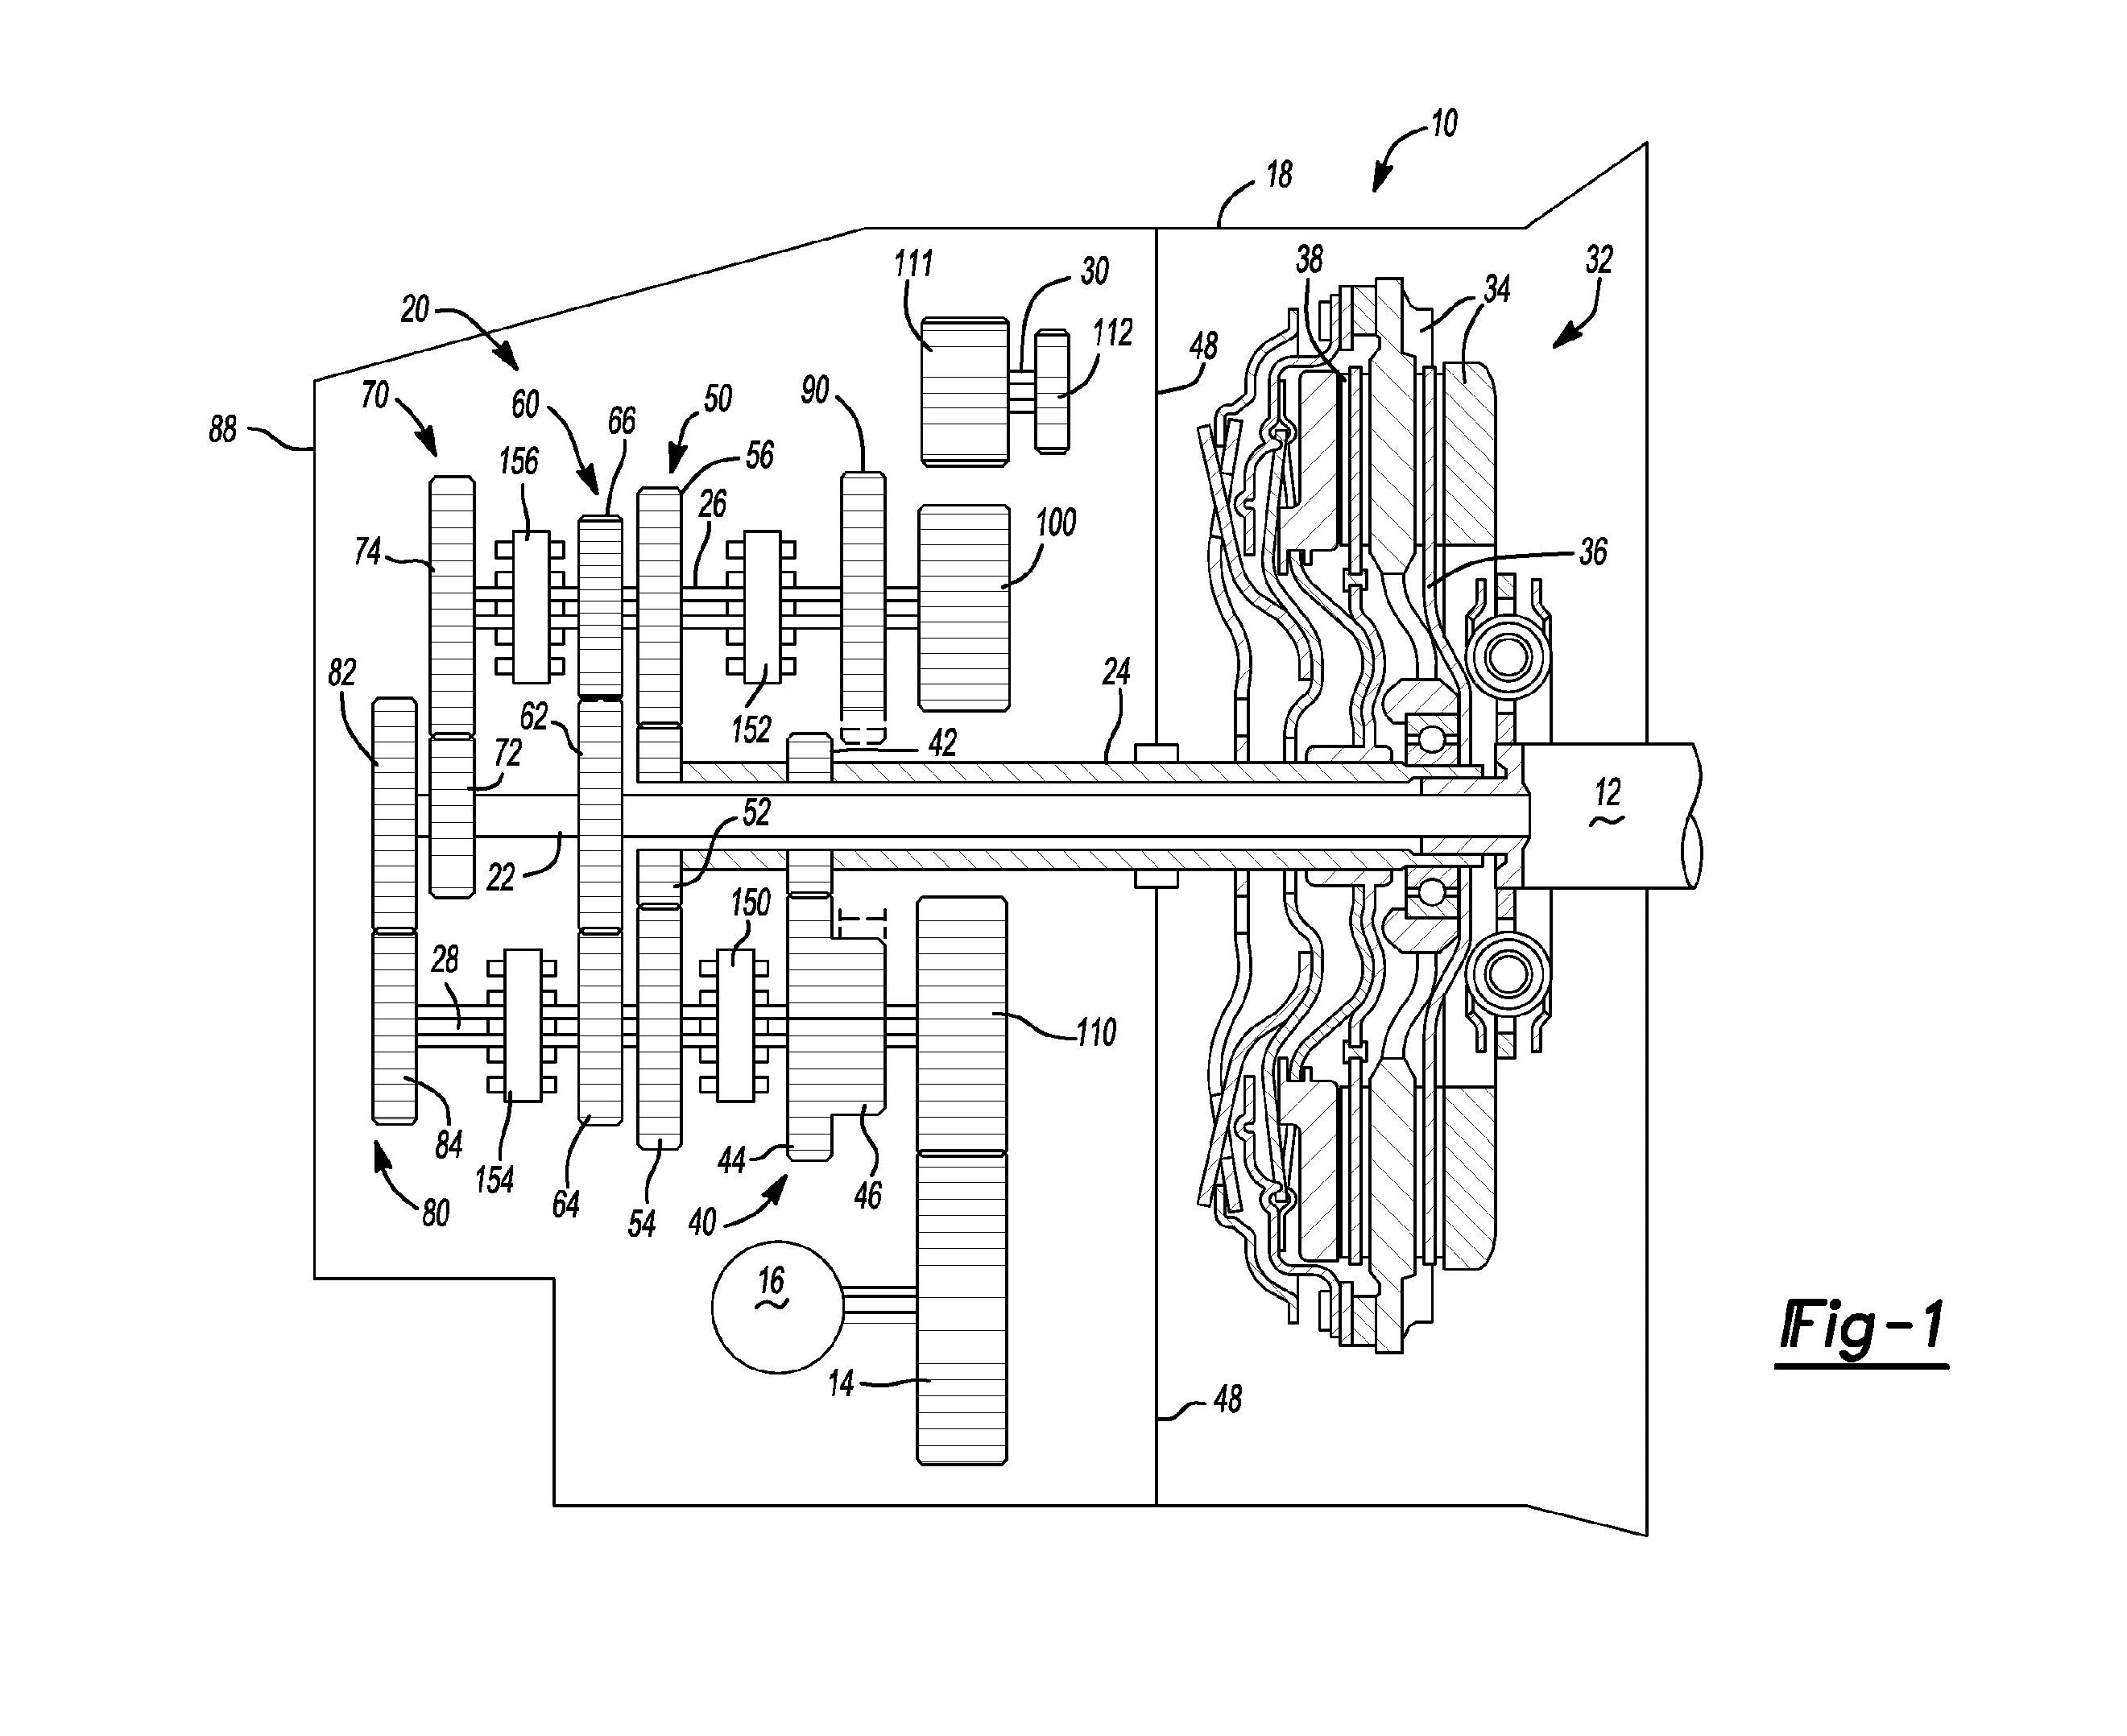 small resolution of gm dual clutch transmission gm high tech performance suzuki clutch diagram gm clutch diagram